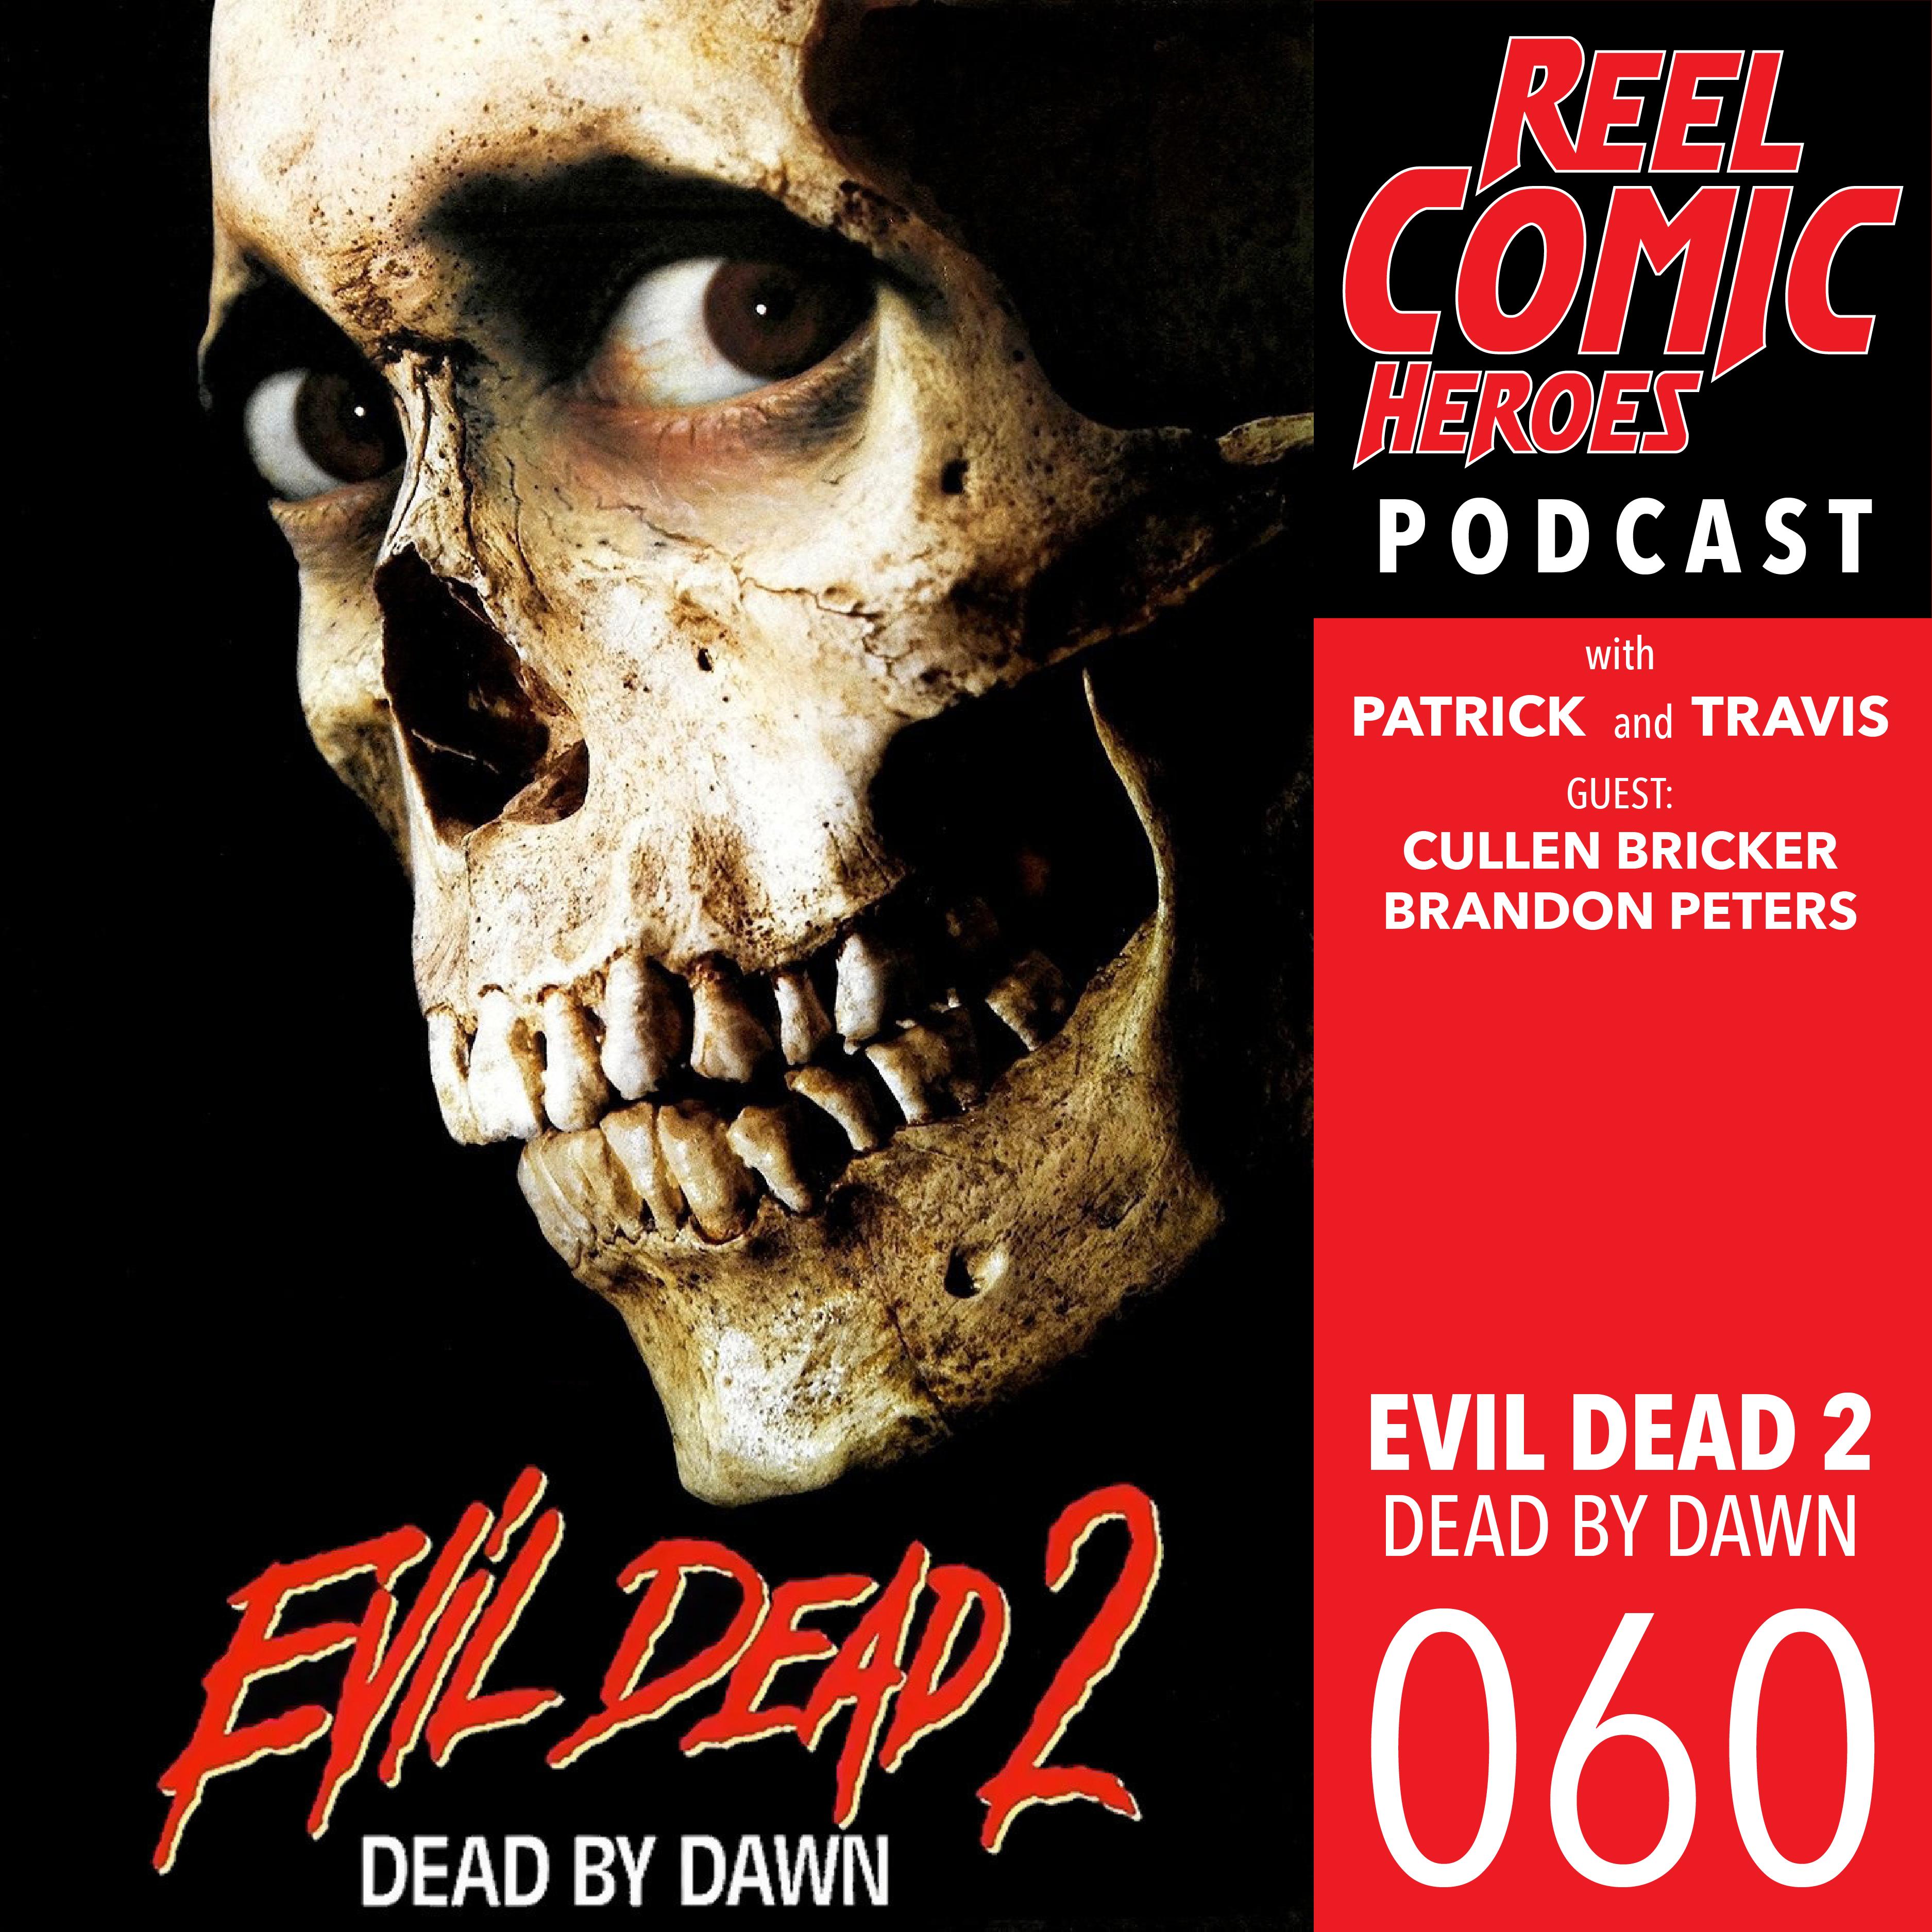 Artwork for Reel Comic Heroes 060 - Evil Dead II with Cullen Bricker and Brandon Peters